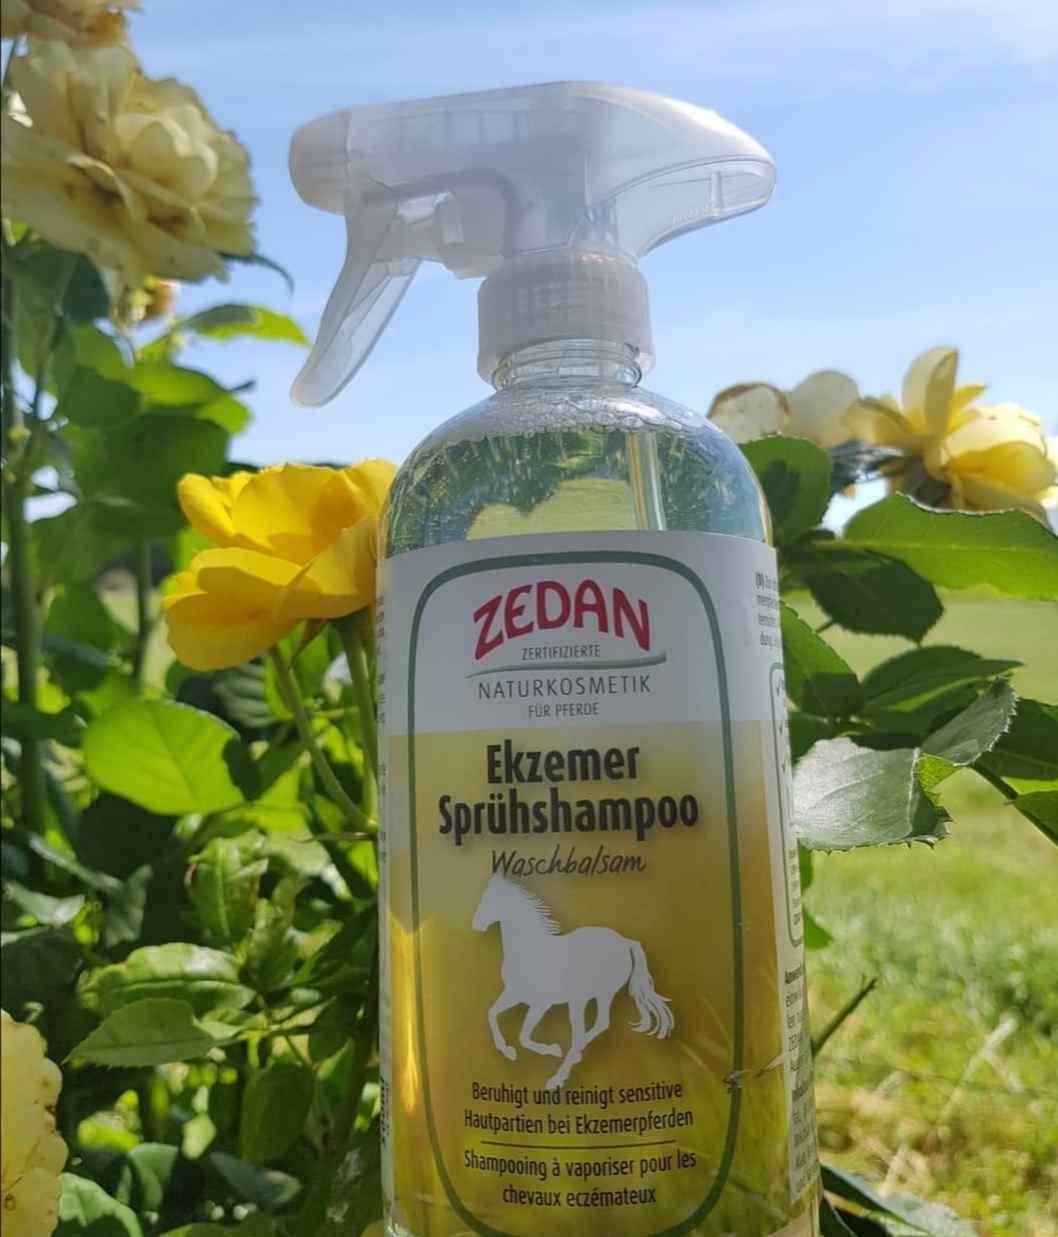 shampoing spray anti dermite Zedan - Equestra